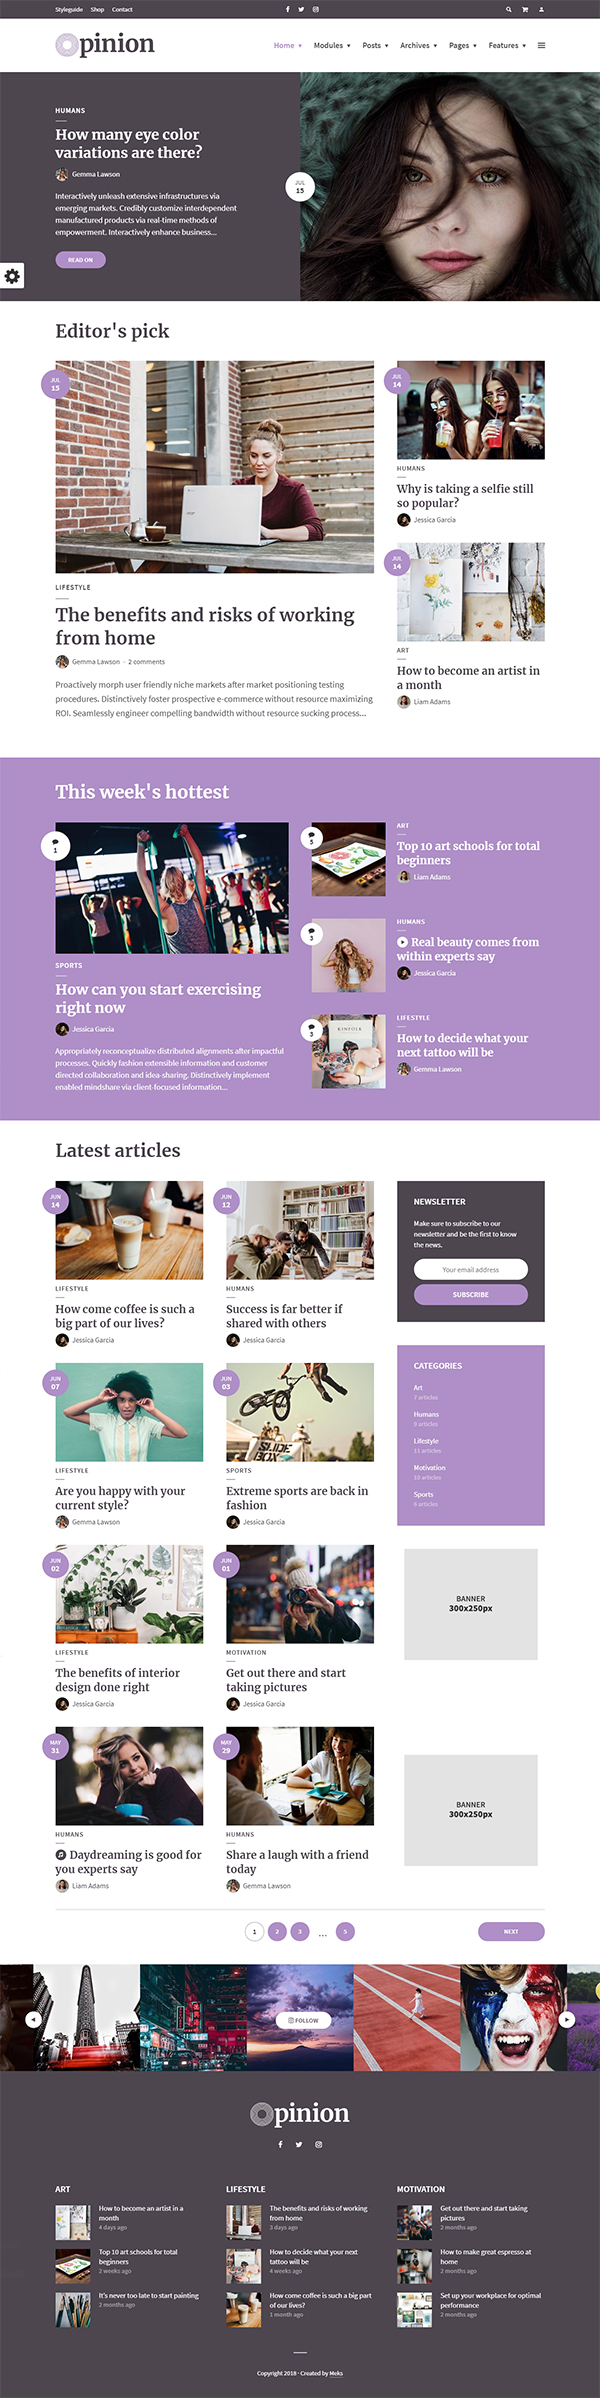 Opinion - Modern News & Magazine Style WordPress Theme